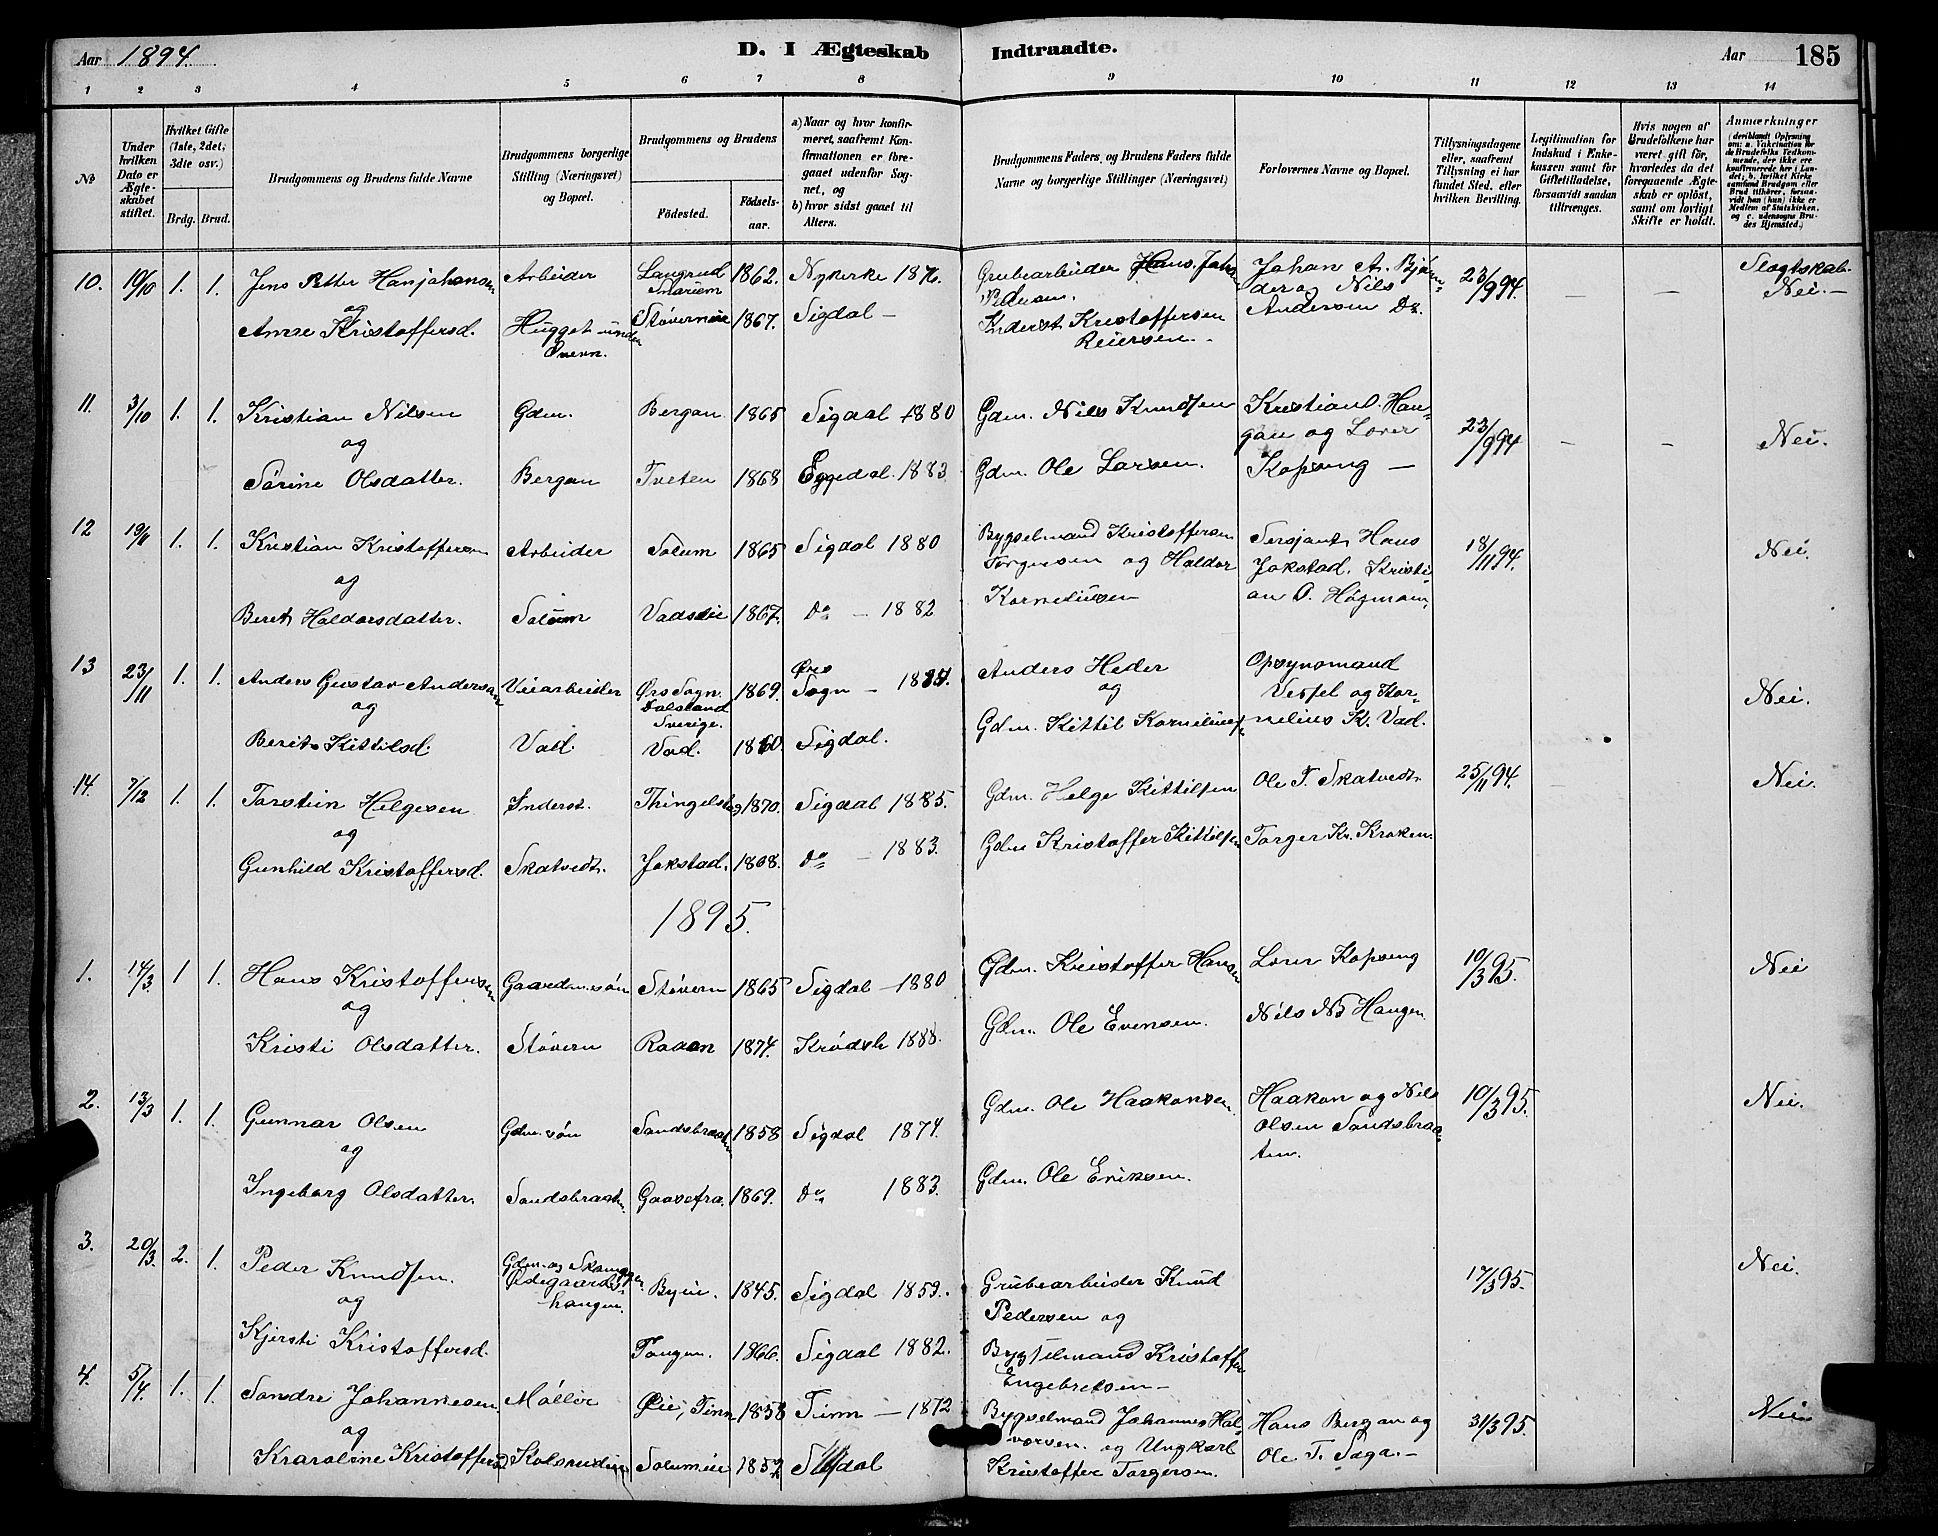 SAKO, Sigdal kirkebøker, G/Ga/L0005: Klokkerbok nr. I 5, 1886-1900, s. 185